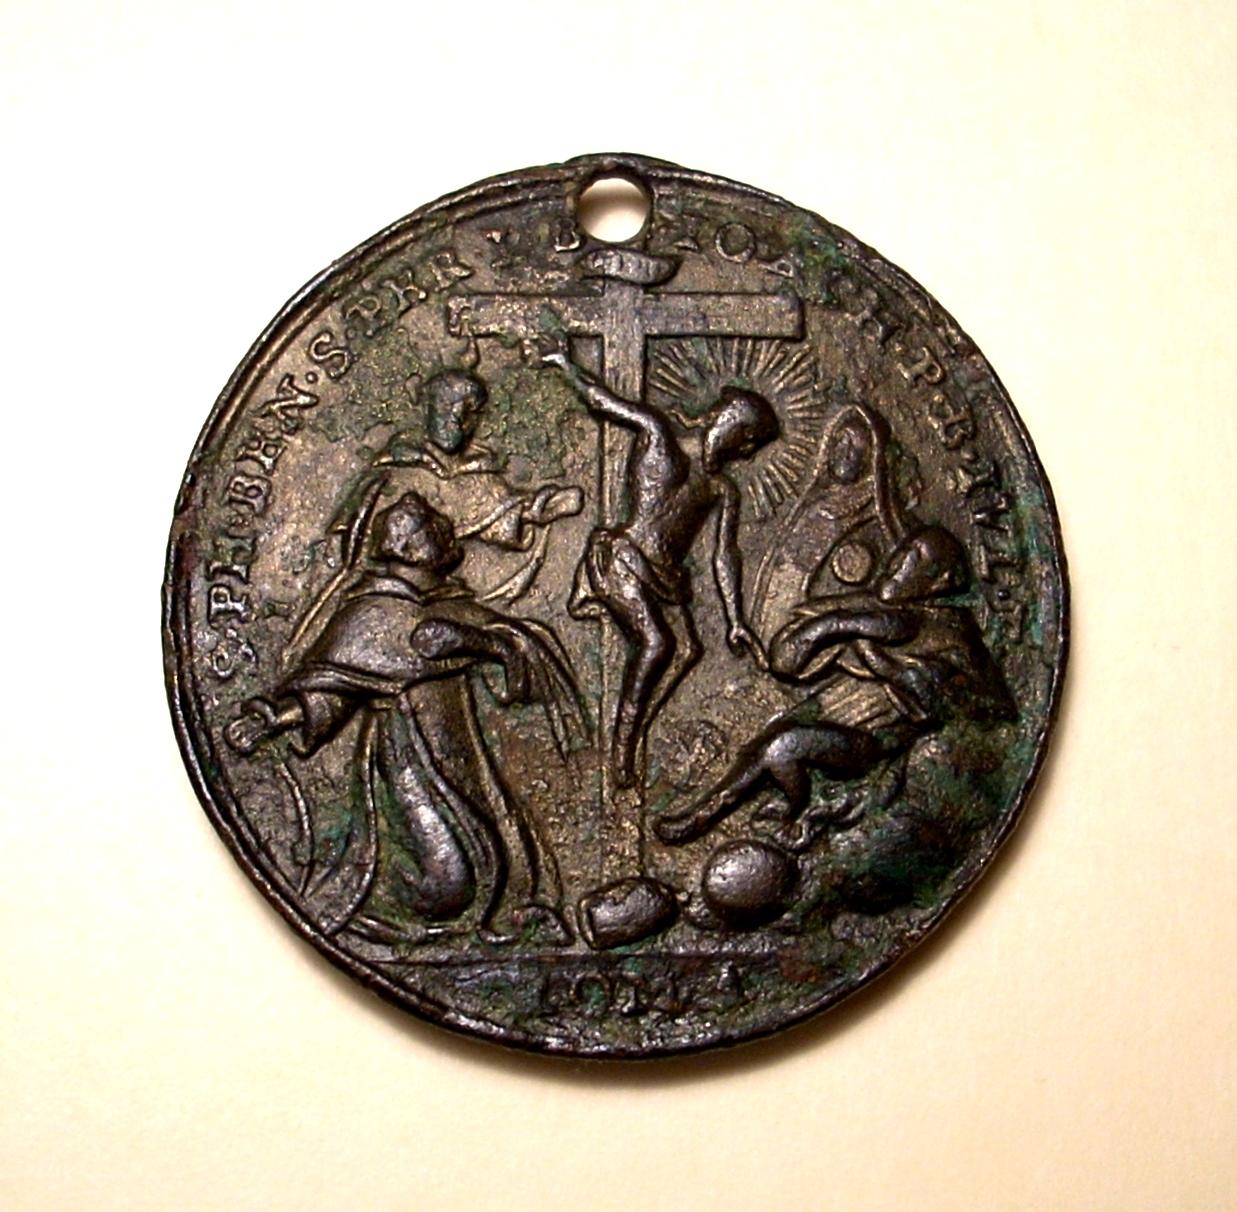 Santos y beatos servitas / Virgen Dolorosa  S. XVIII  (R.M. SXVIII-C54) 4ilut2